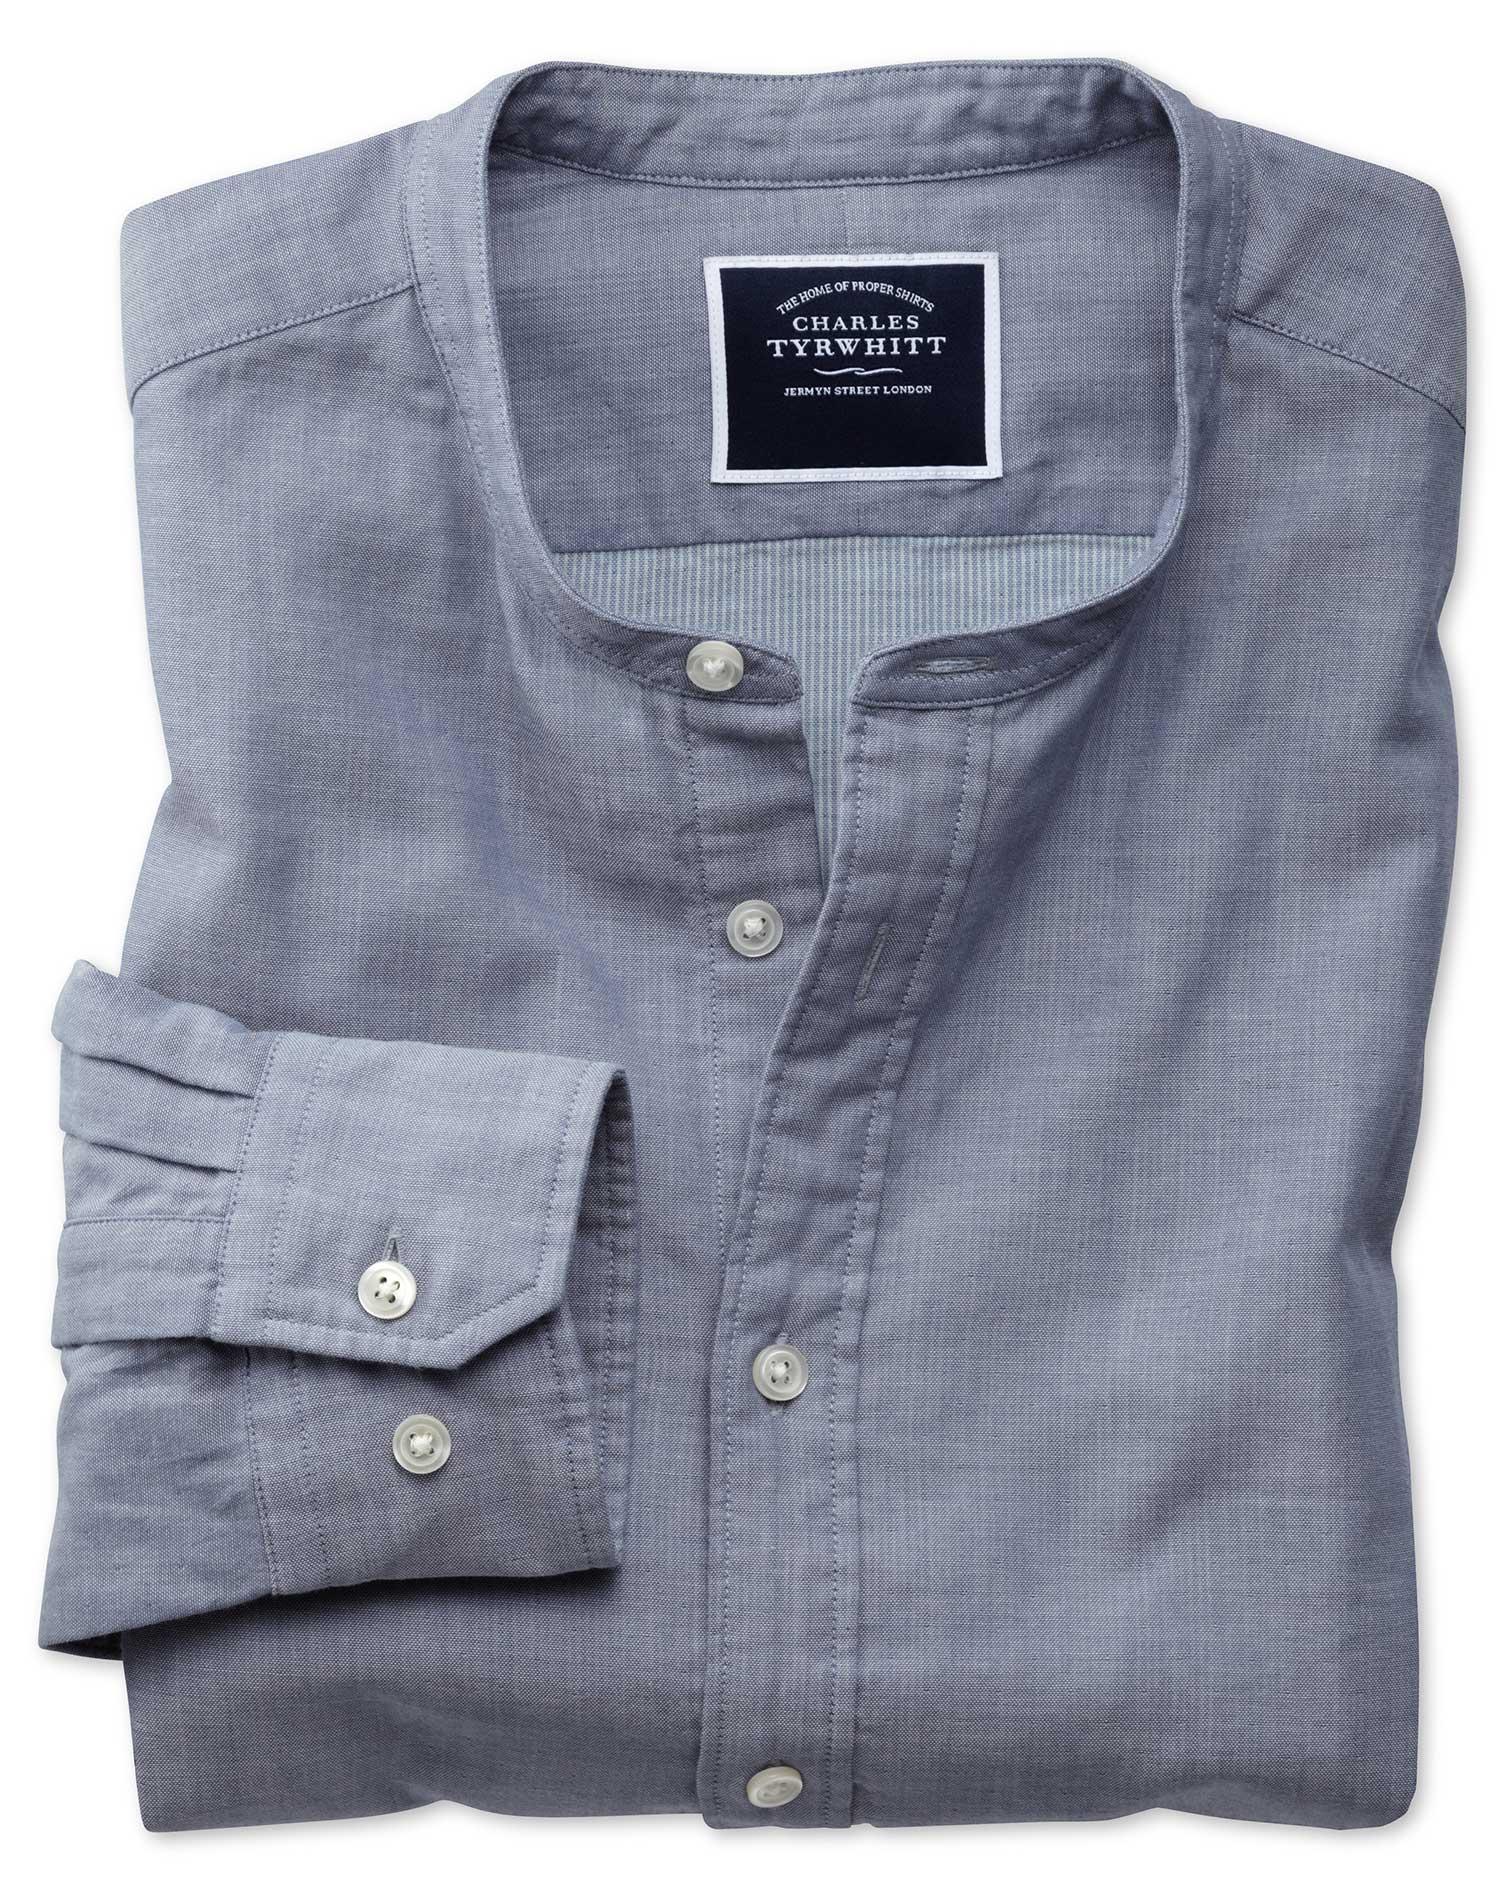 Slim Fit Collarless Chambray Cotton Shirt Single Cuff Size Medium by Charles Tyrwhitt